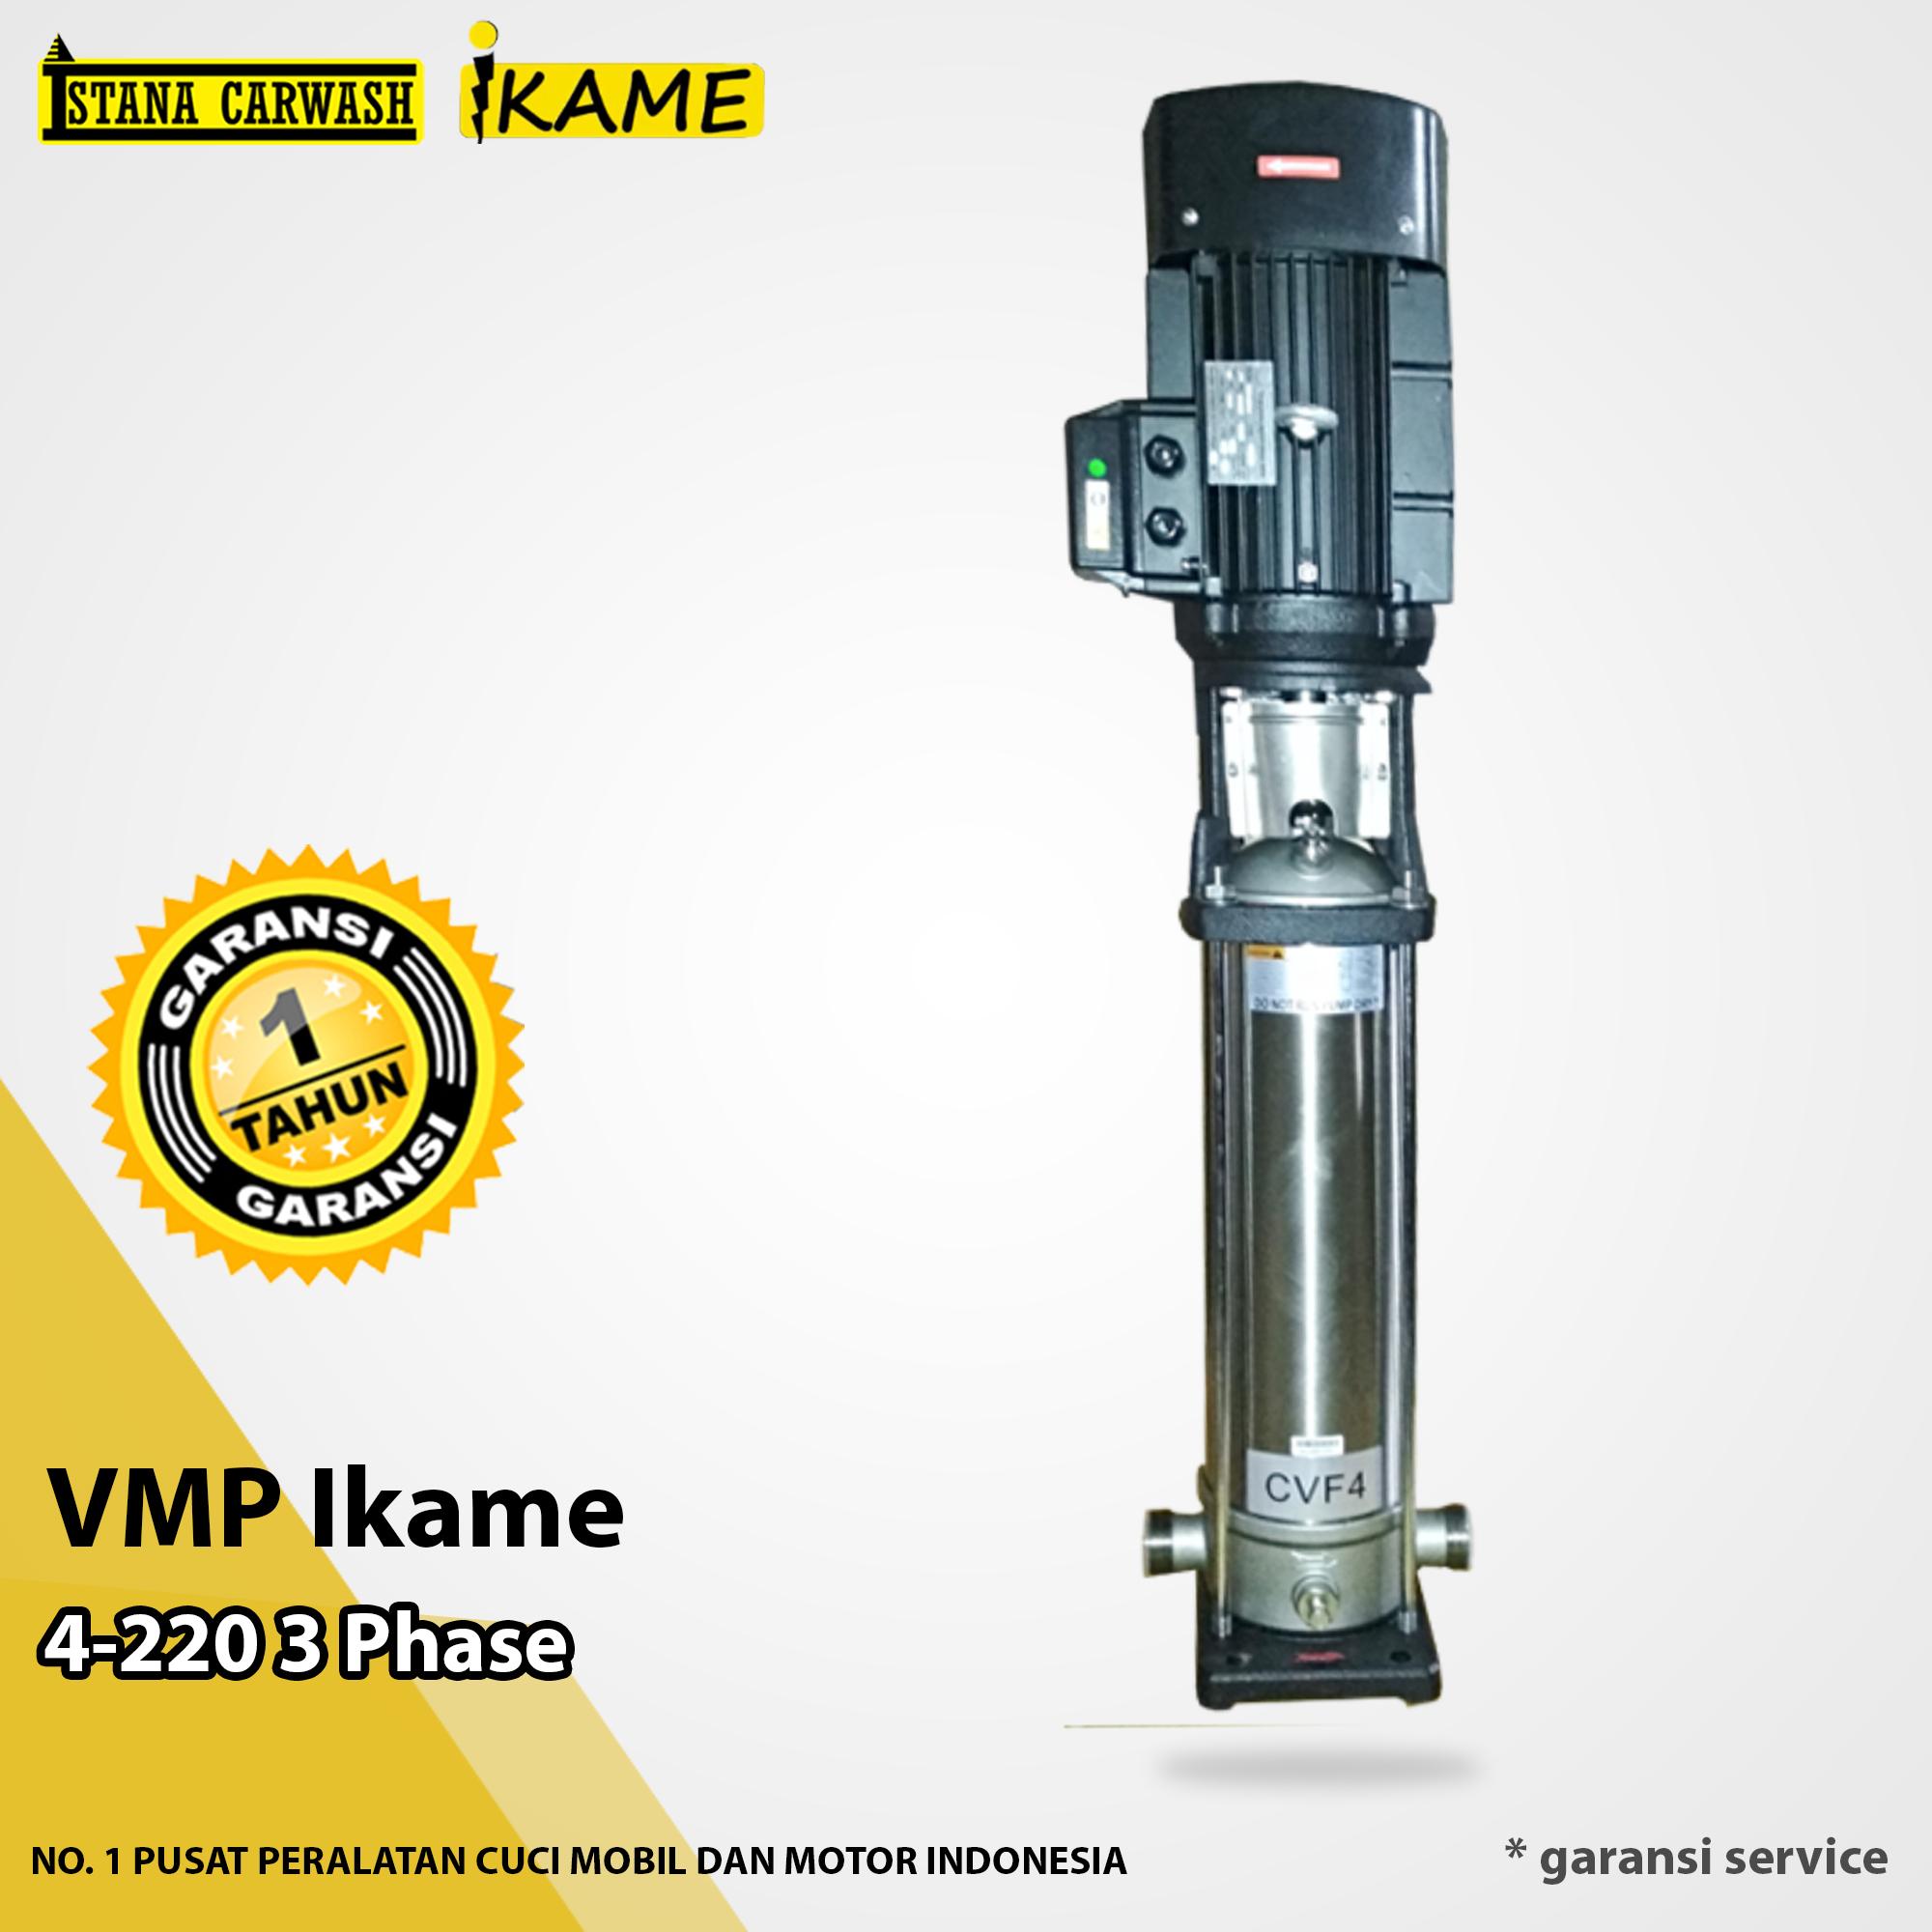 VMP Ikame 4 – 220, 3 Phase